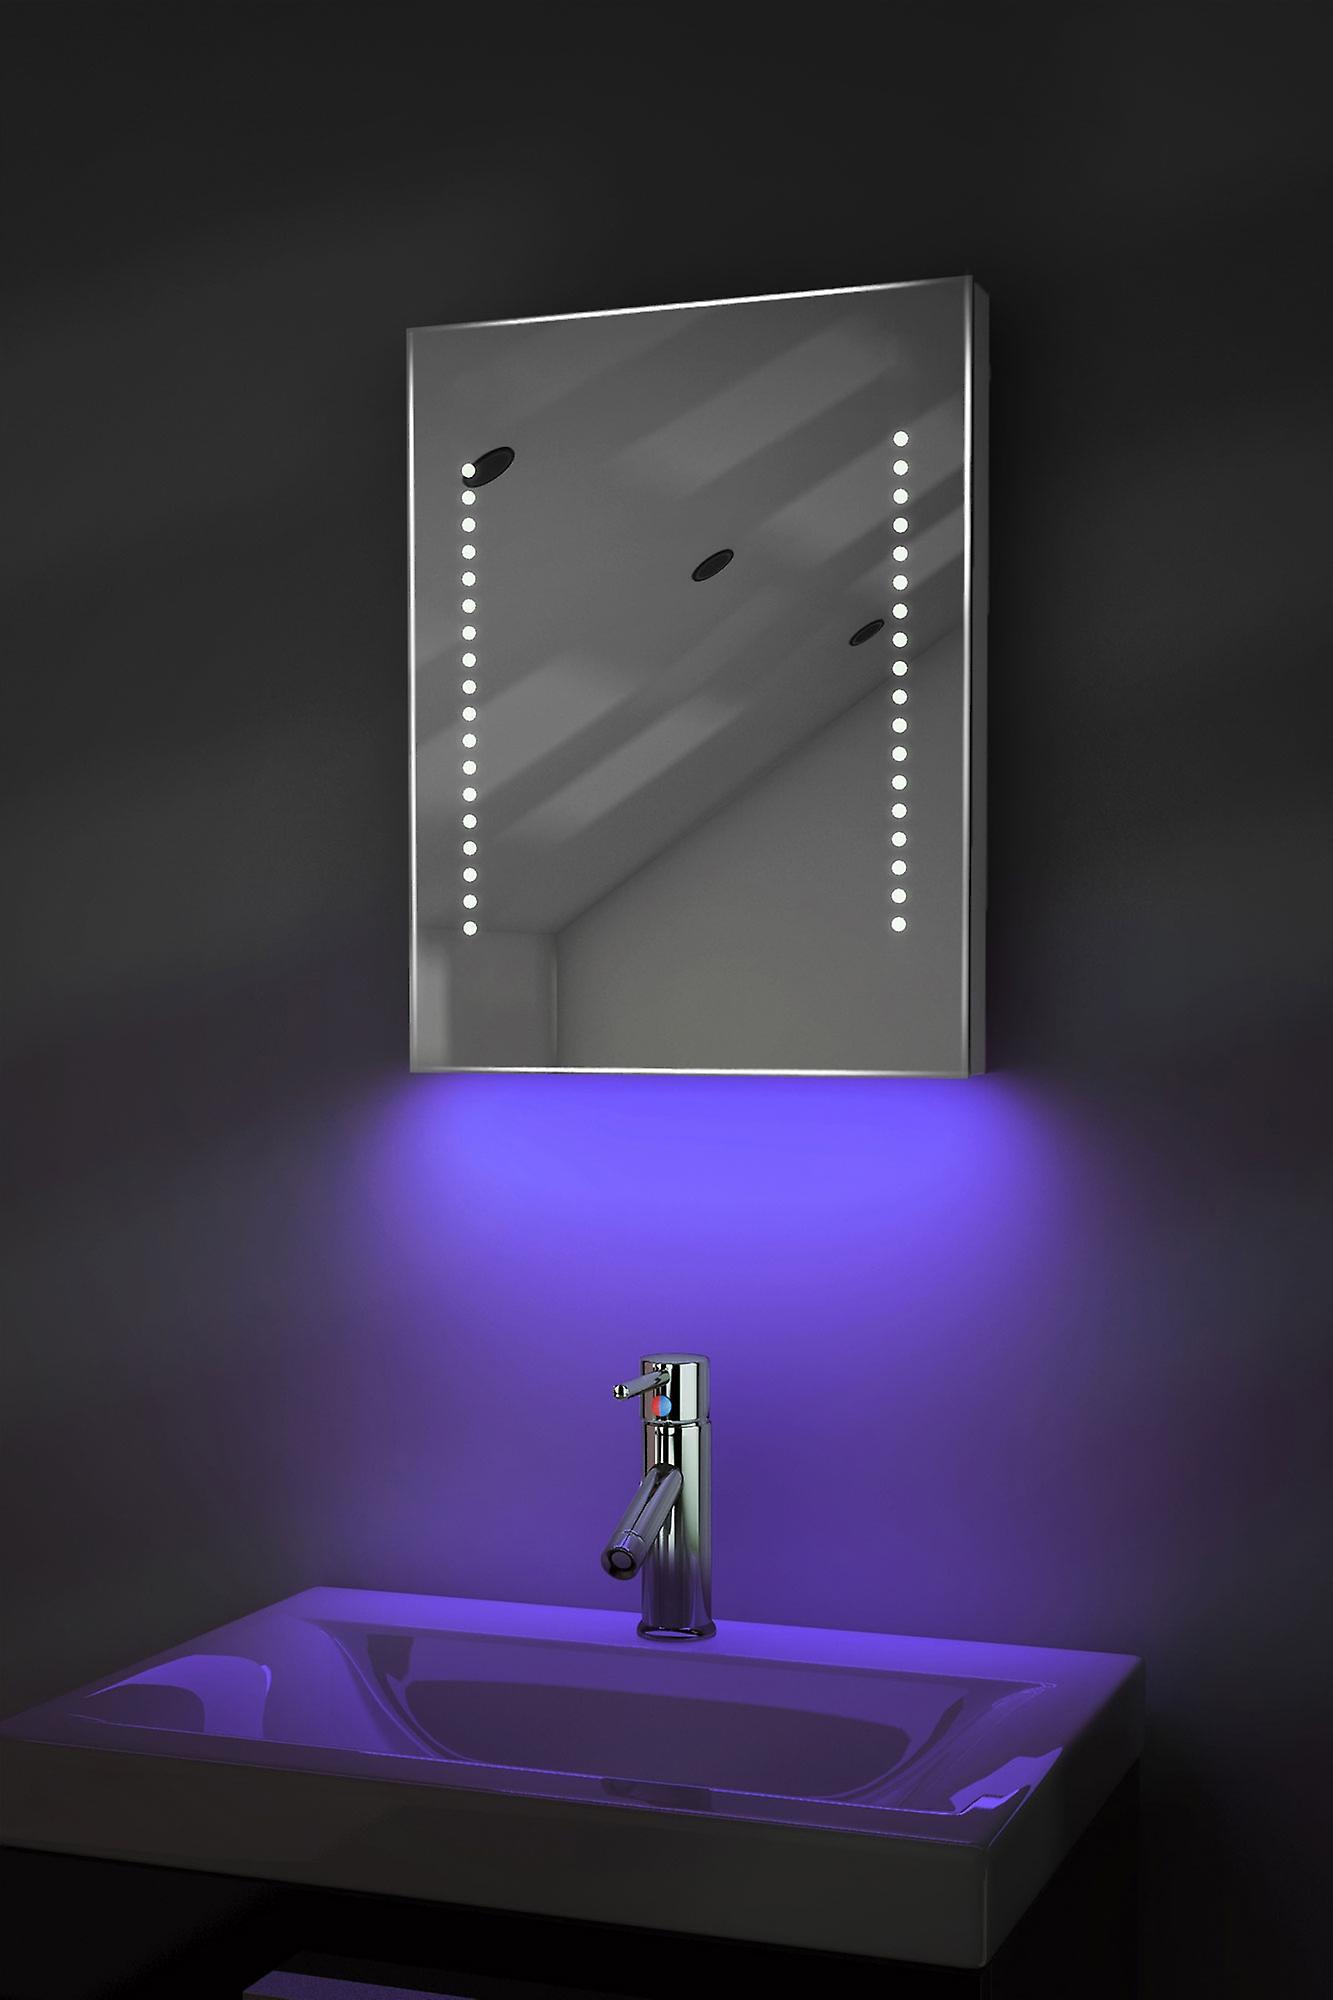 Ambient Shaver LED Bathroom Mirror With Demister Pad & Sensor K36sb